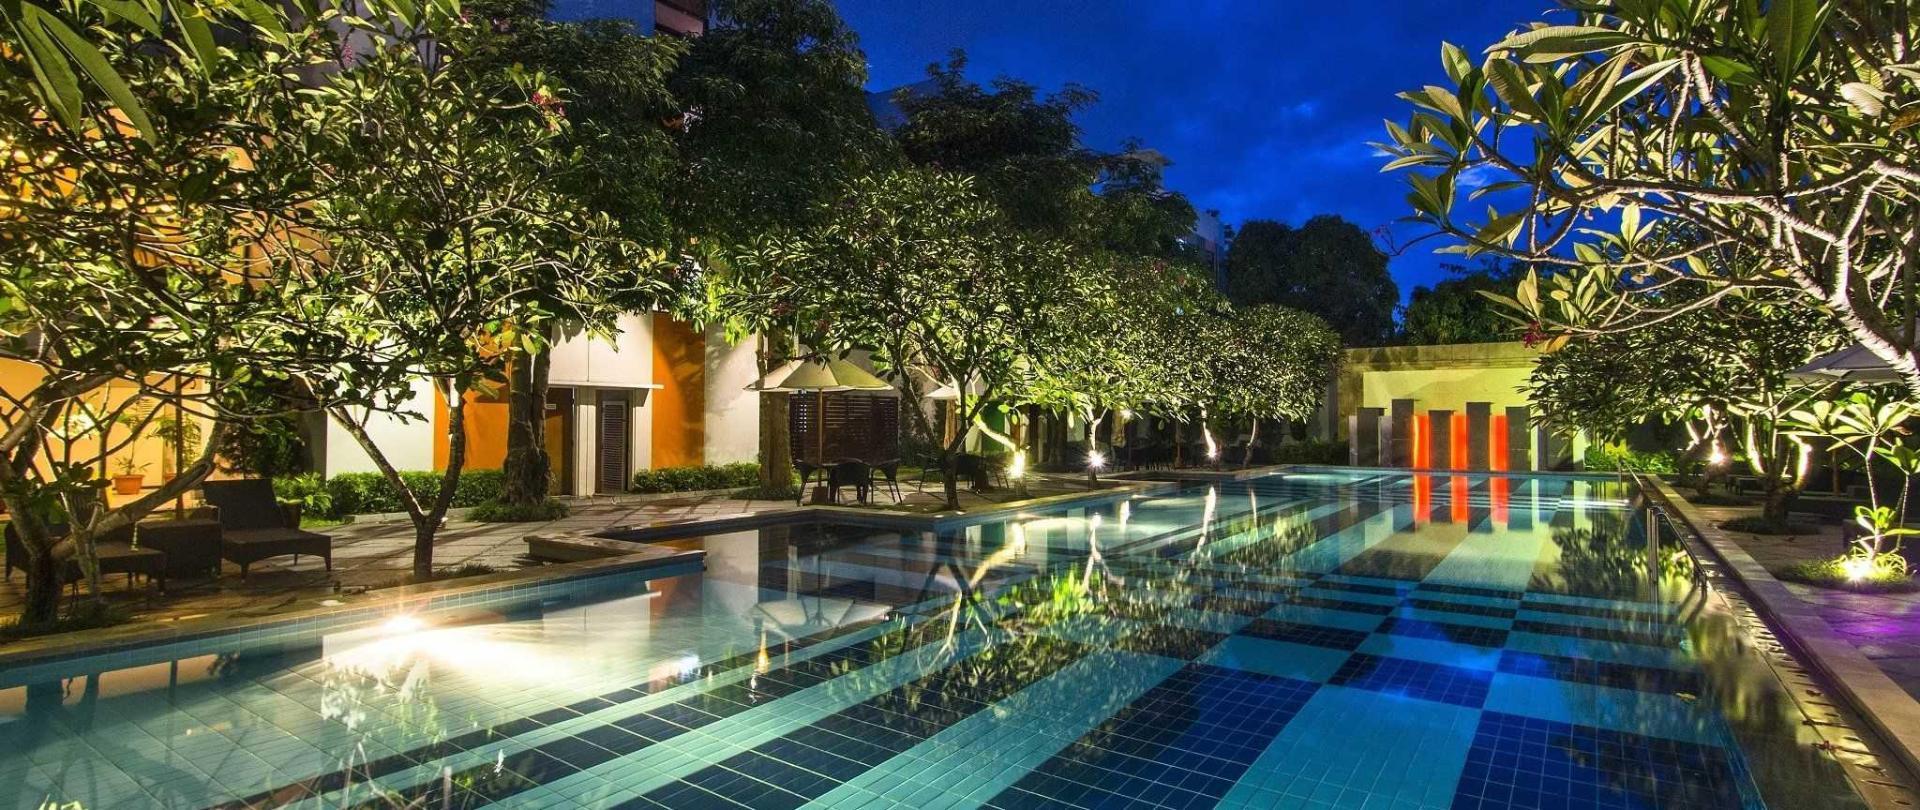 pool-evening-1.jpg